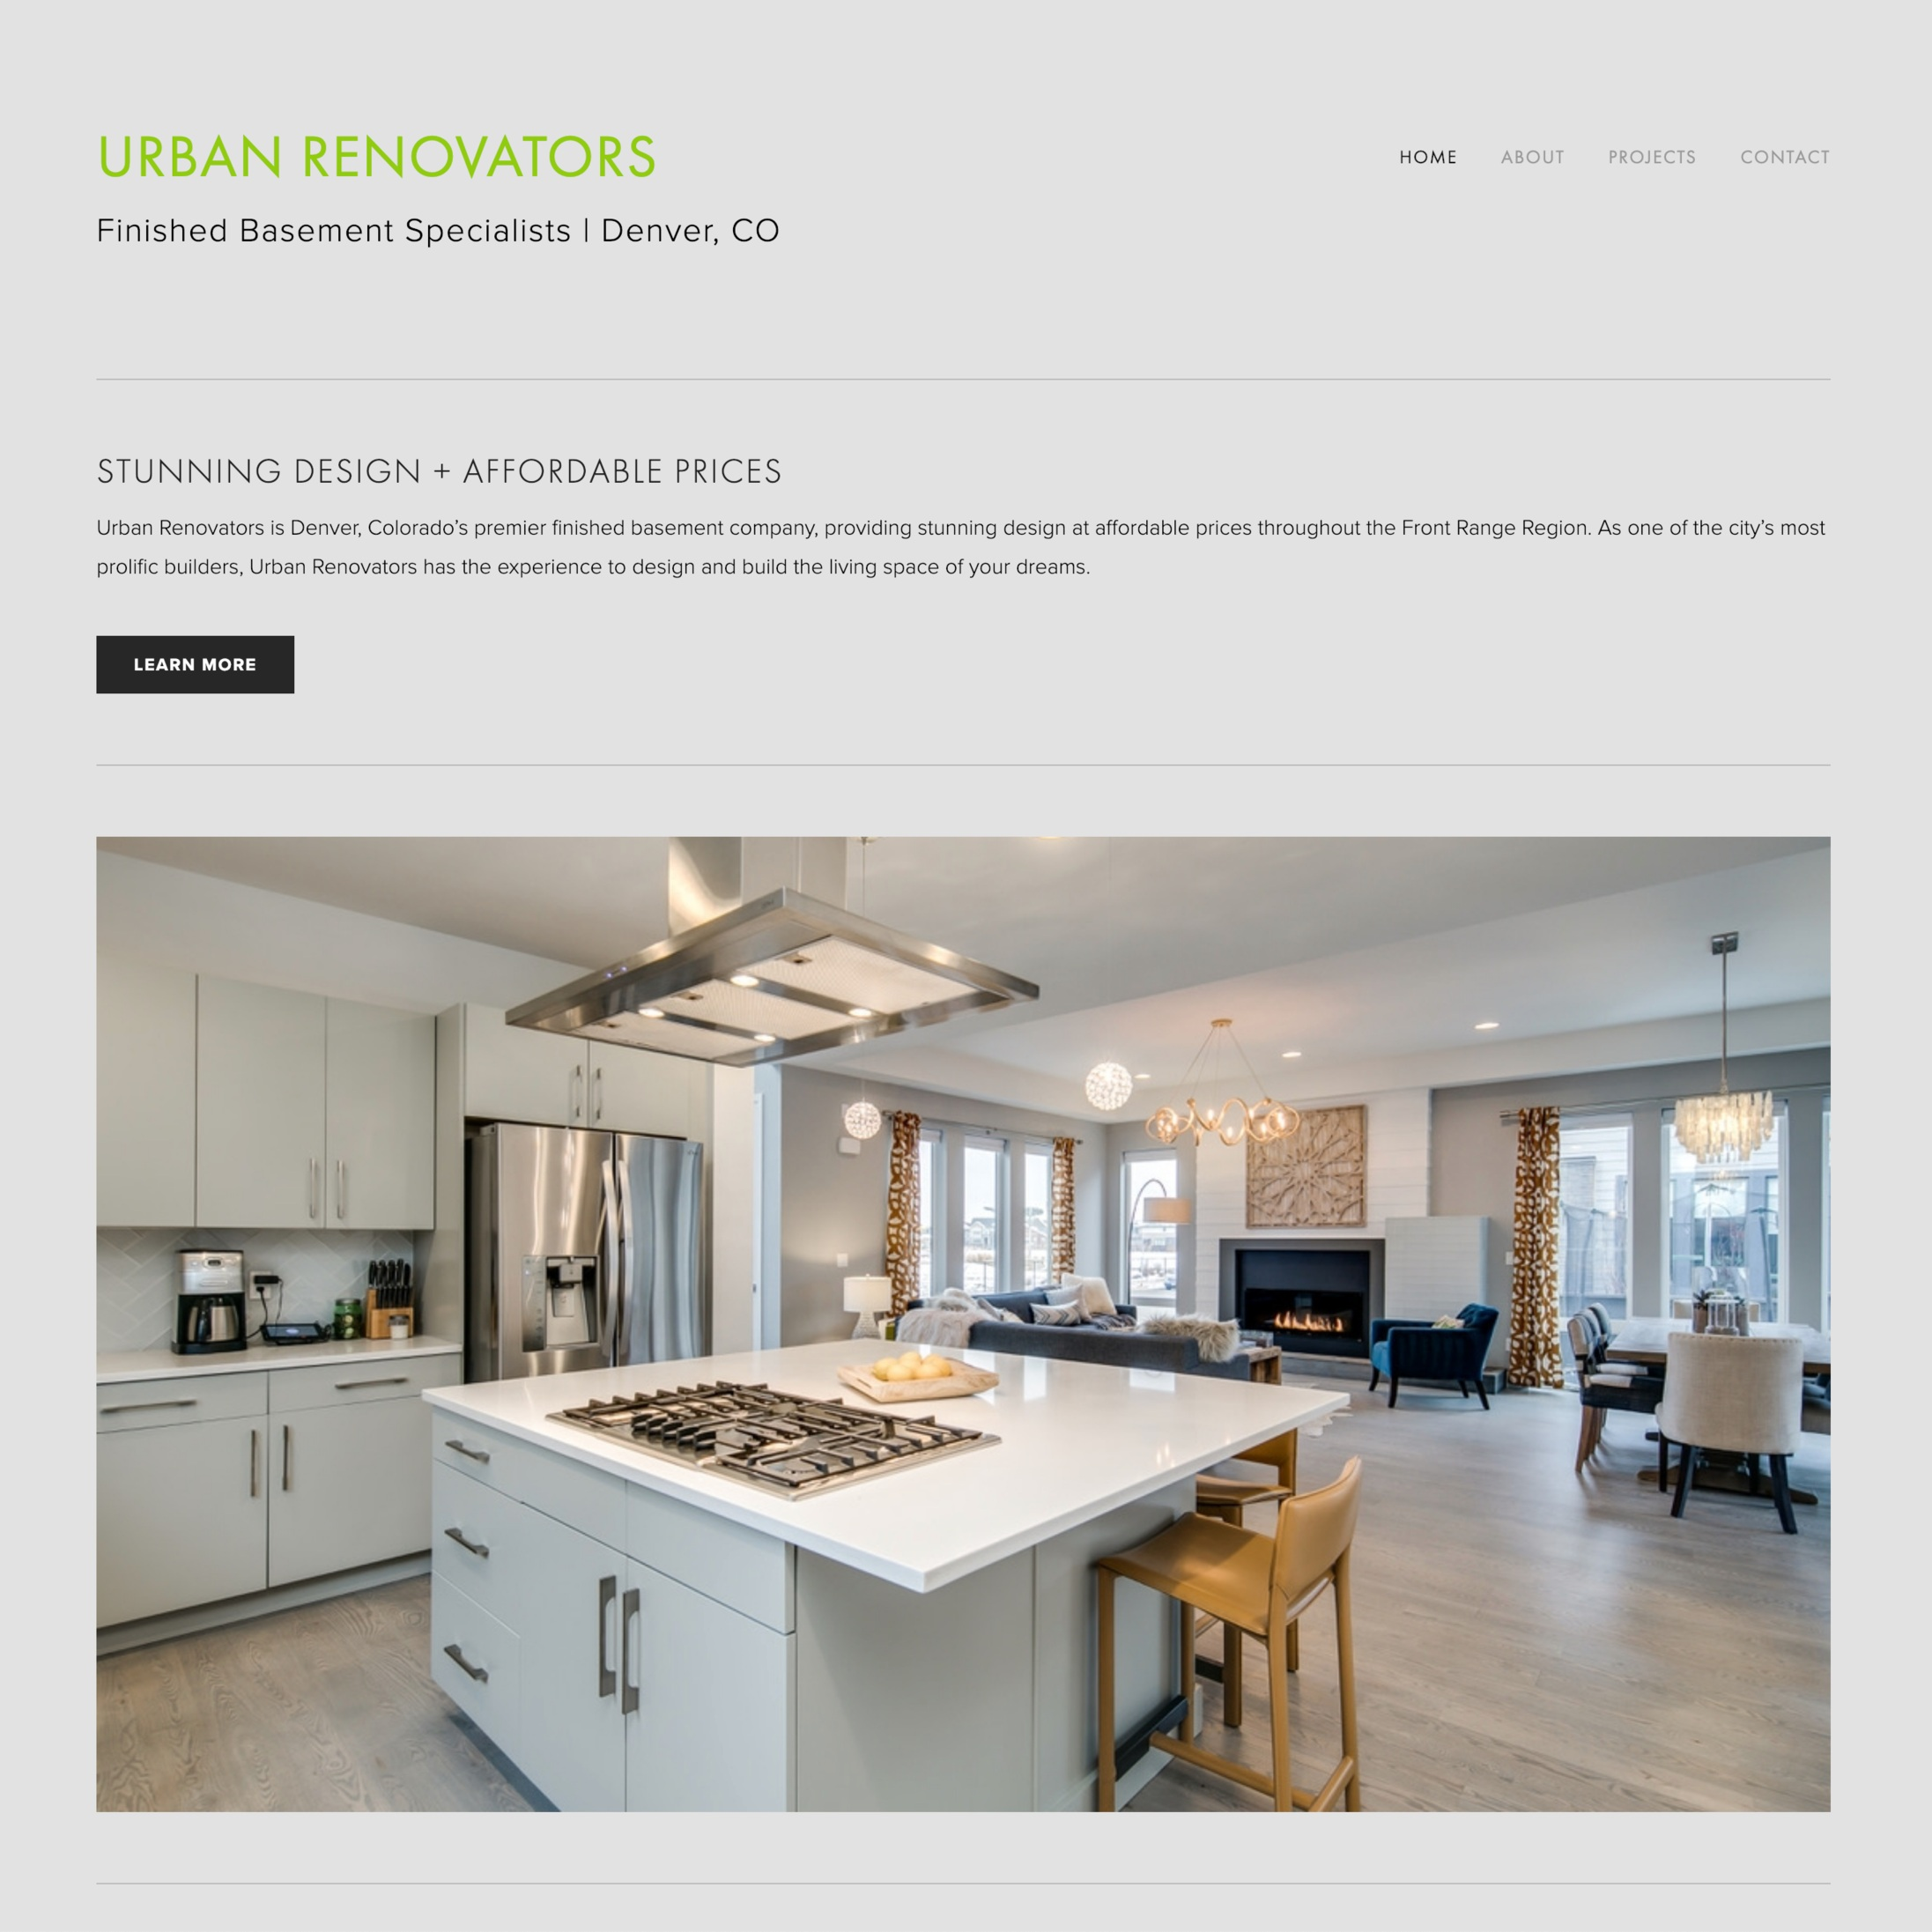 Urban Renovators (Coming Soon)